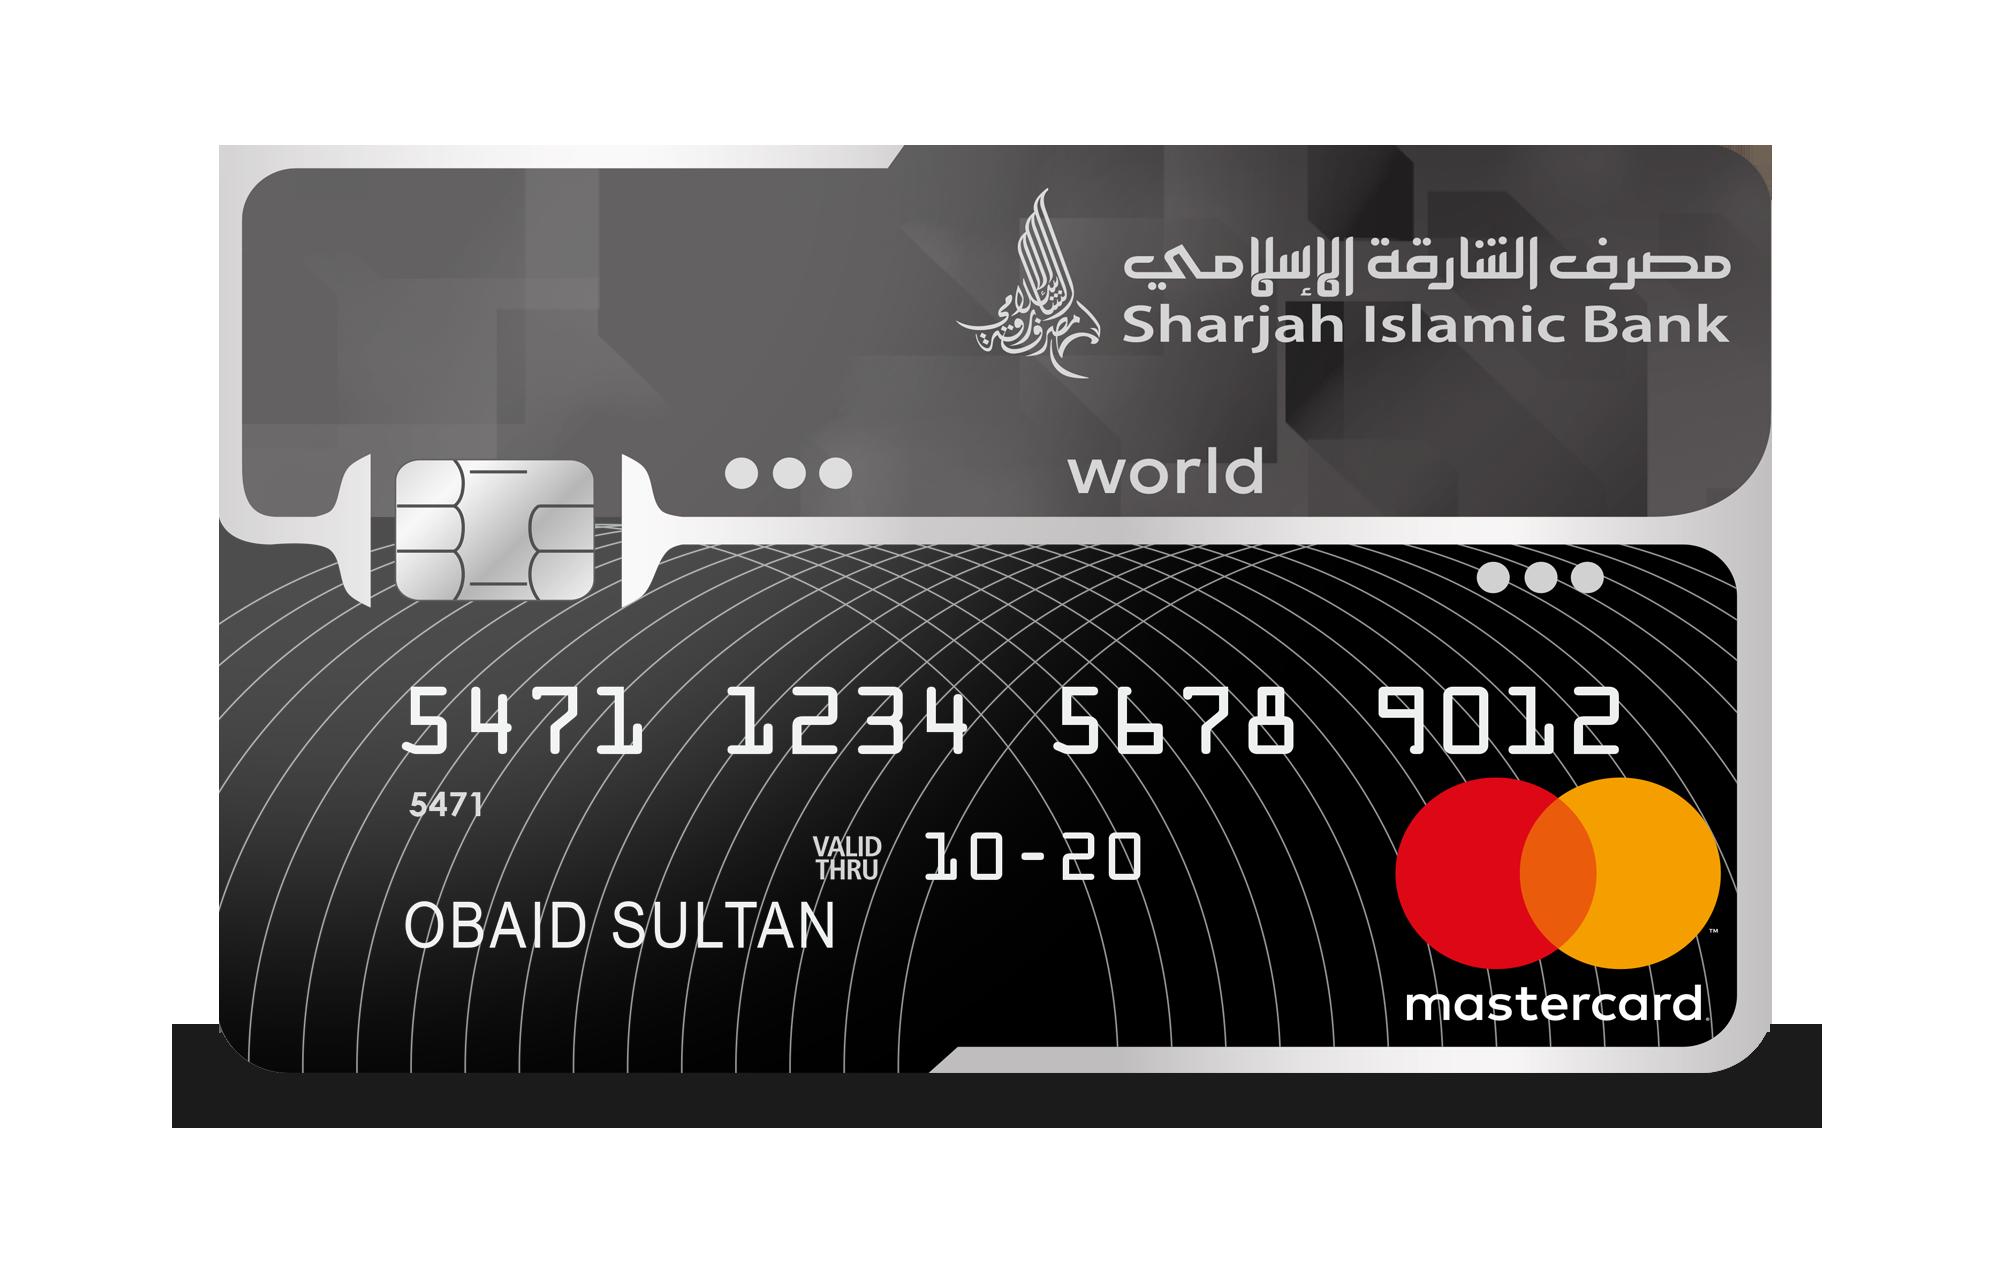 SIB - Smiles World Credit Card